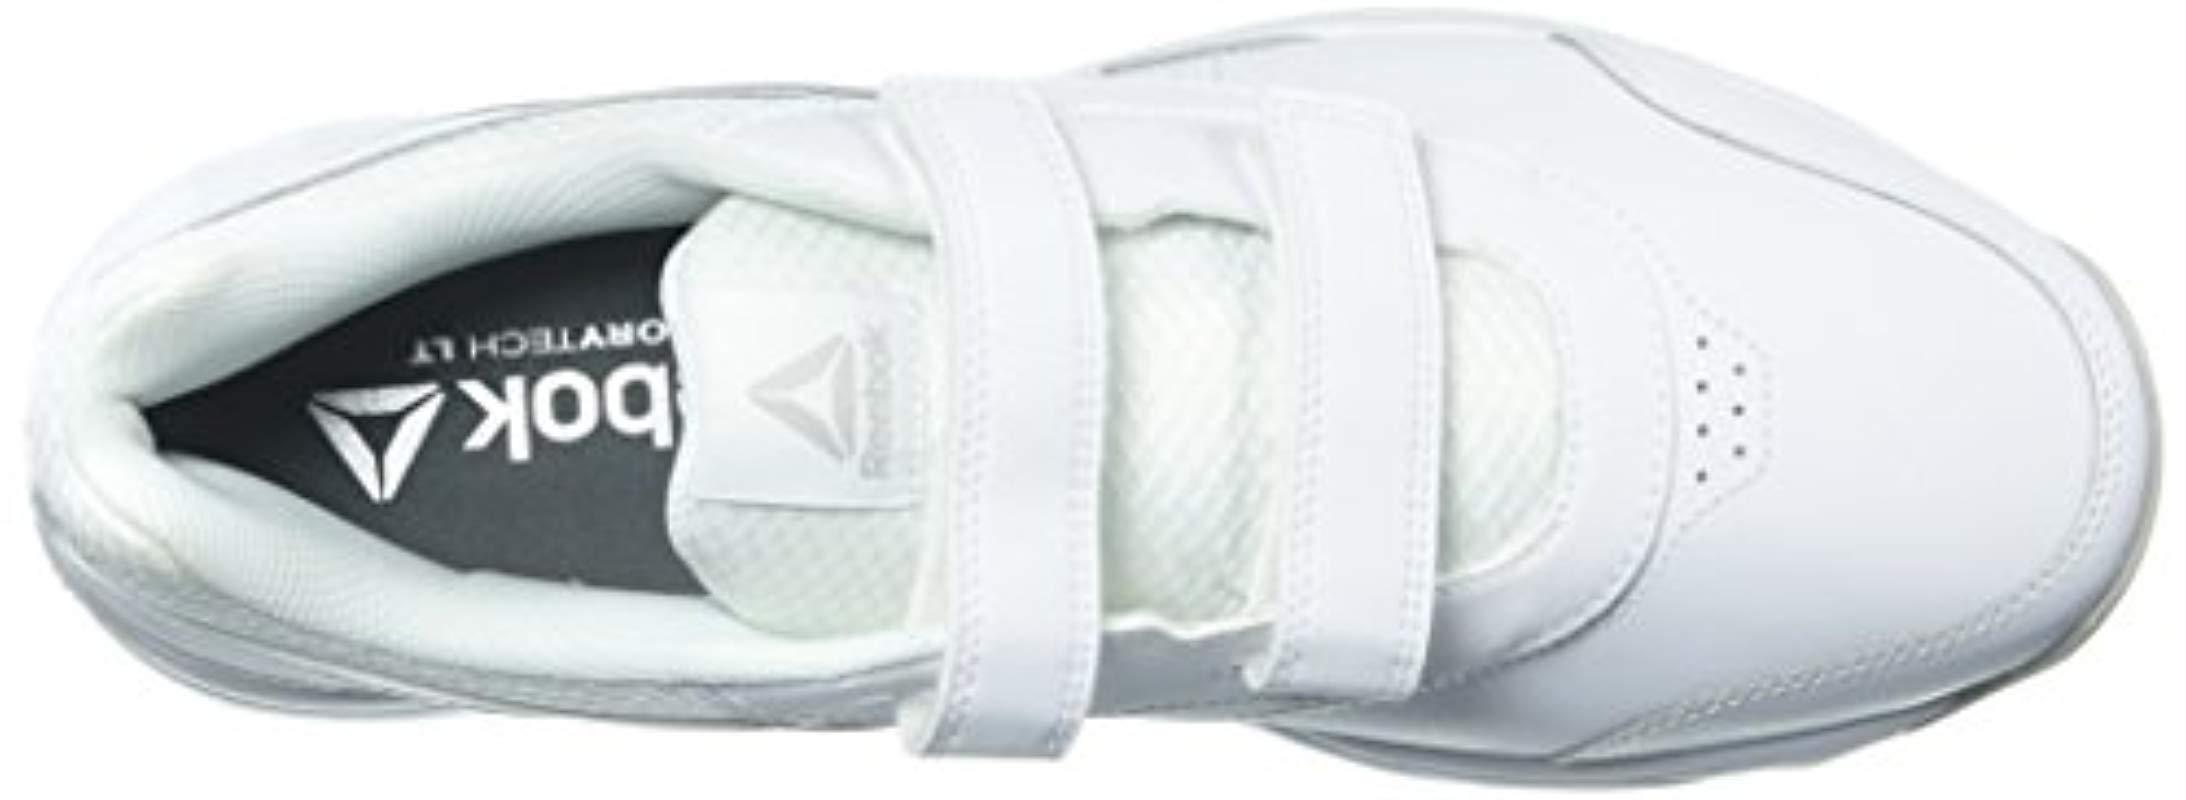 384f8b7787f72 Men's White Work N Cushion 3.0 Kc Walking Shoe